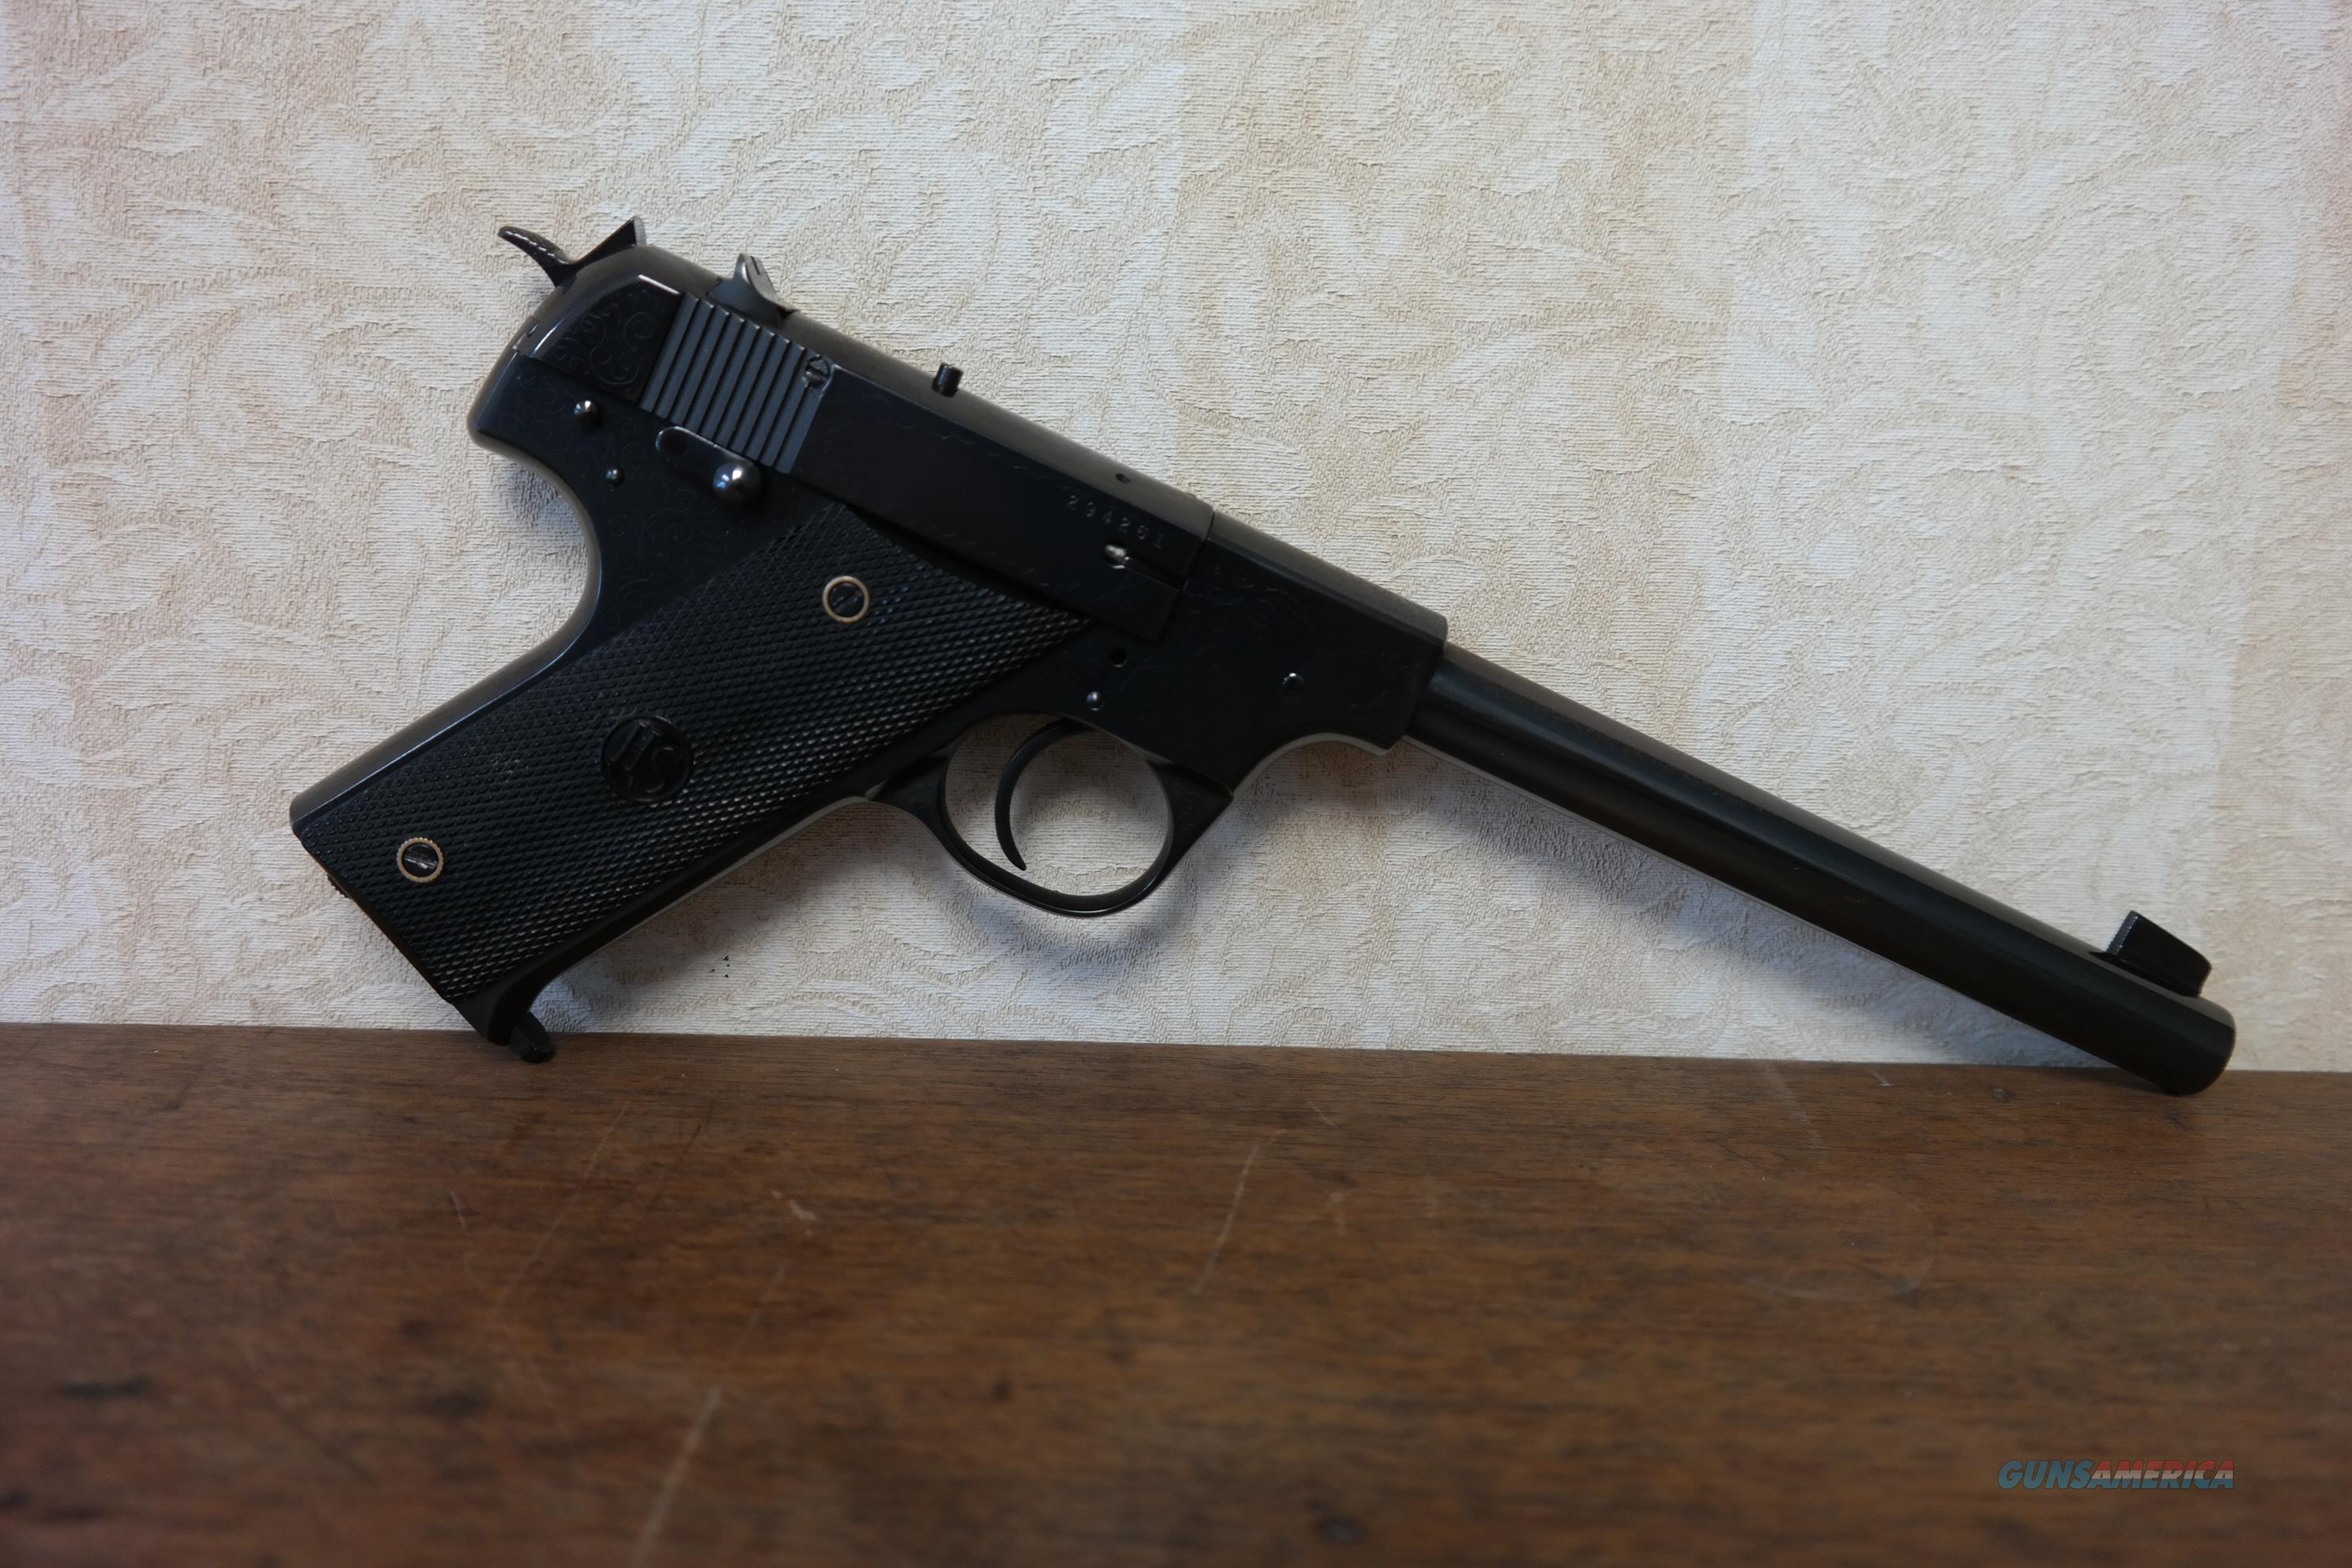 High Standard HB .22LR Pistol  Guns > Pistols > High Standard Pistols